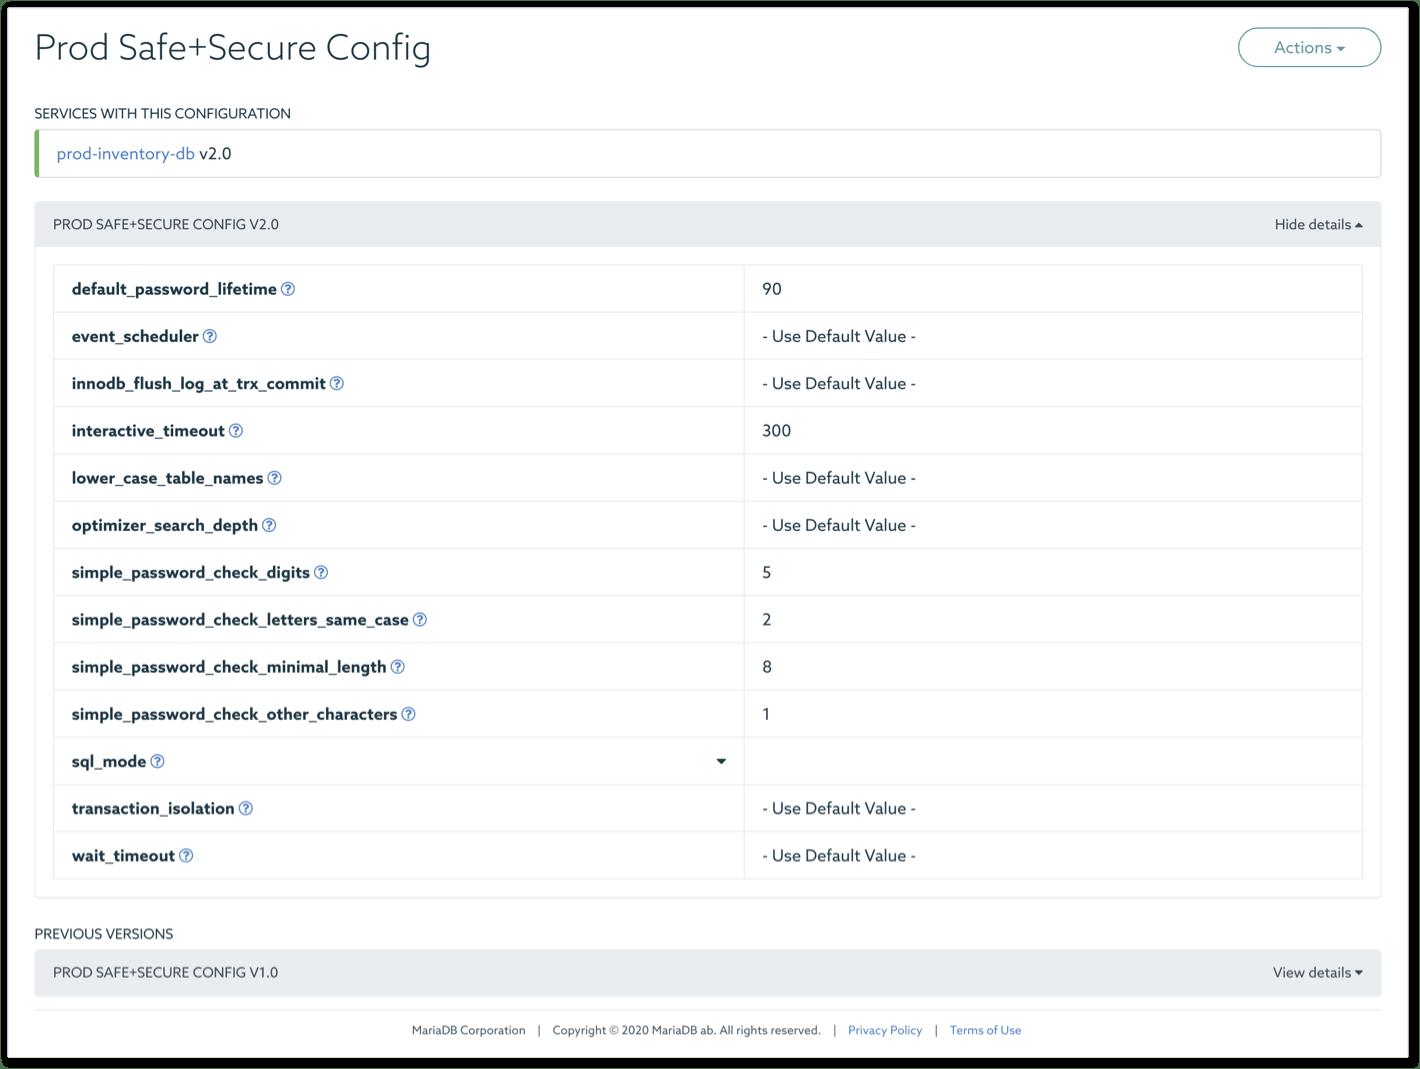 MariaDB SkySQL configuration management